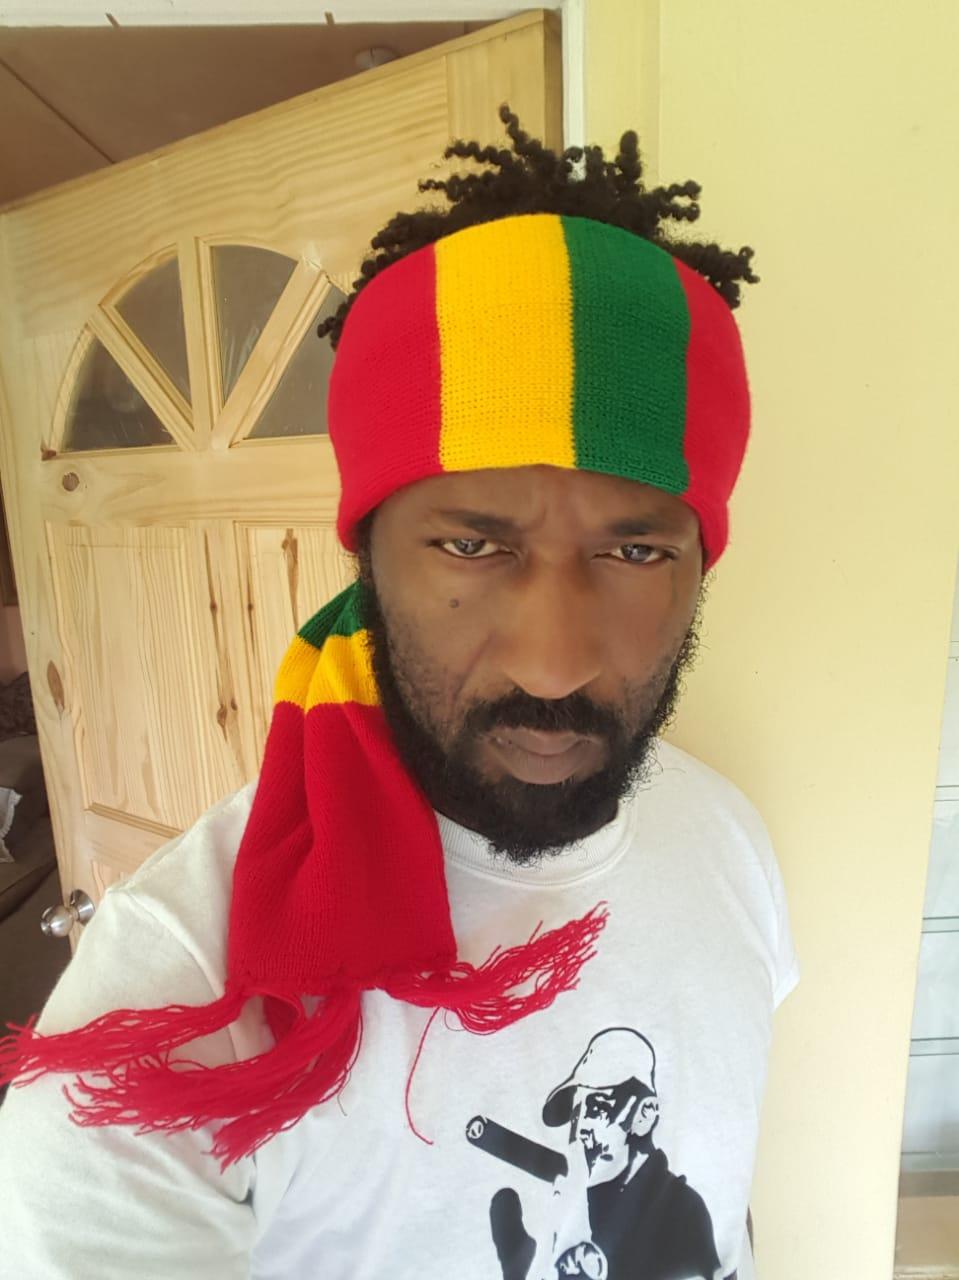 Heard on Irie FM, HITZ FM, ZIP FM  and more, Teeardropz aka Jonathan Brown, is a Jamaican reggae artist who drops 'Wake up list'